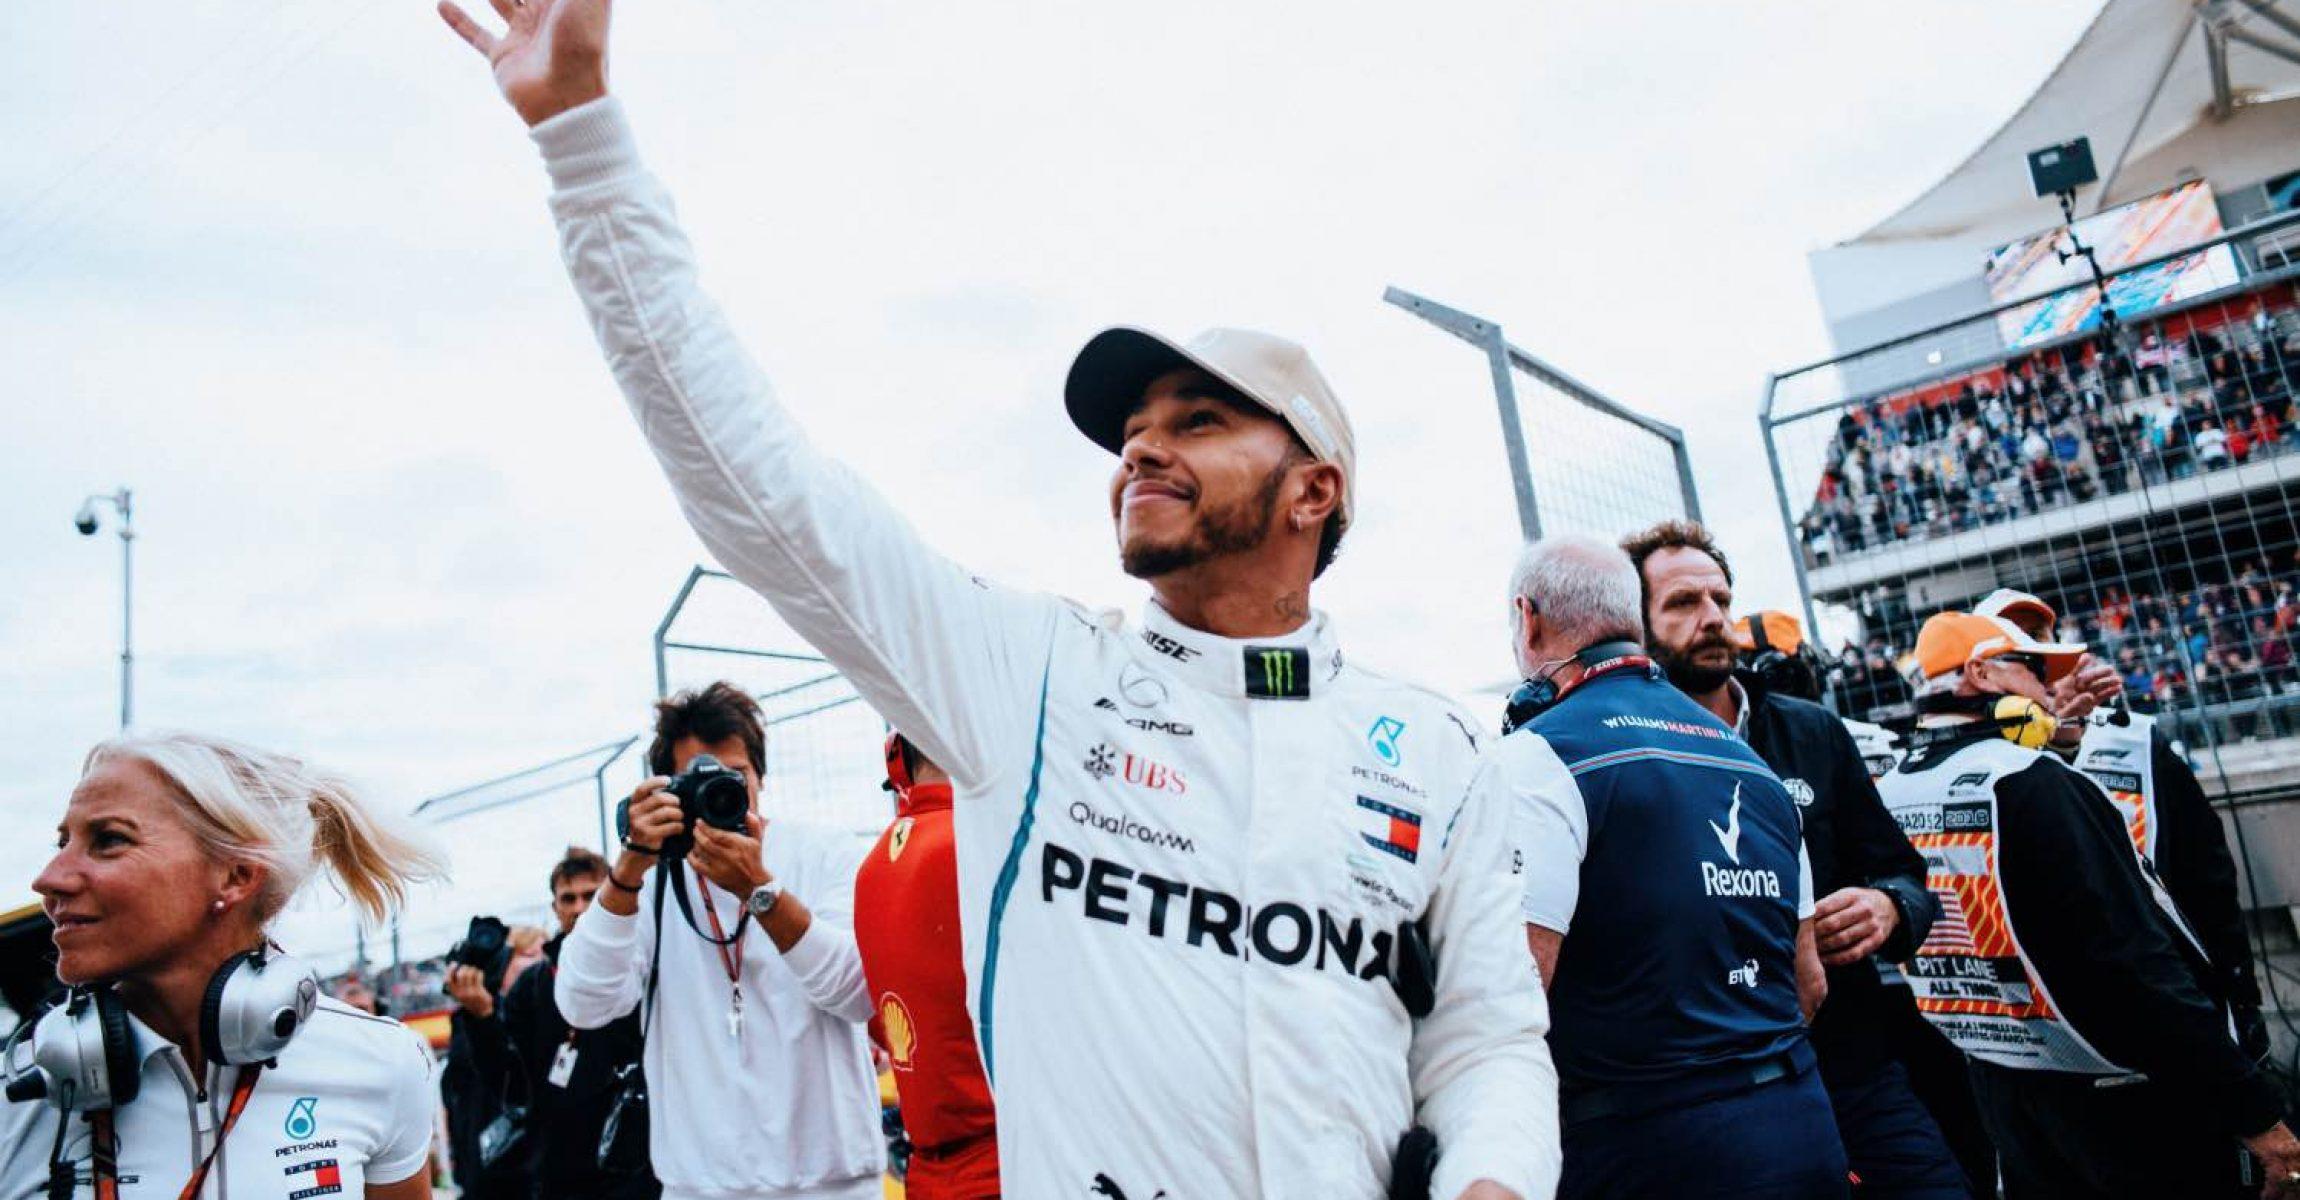 2018 United States Grand Prix, Saturday - Paul Ripke Lewis Hamilton Mercedes